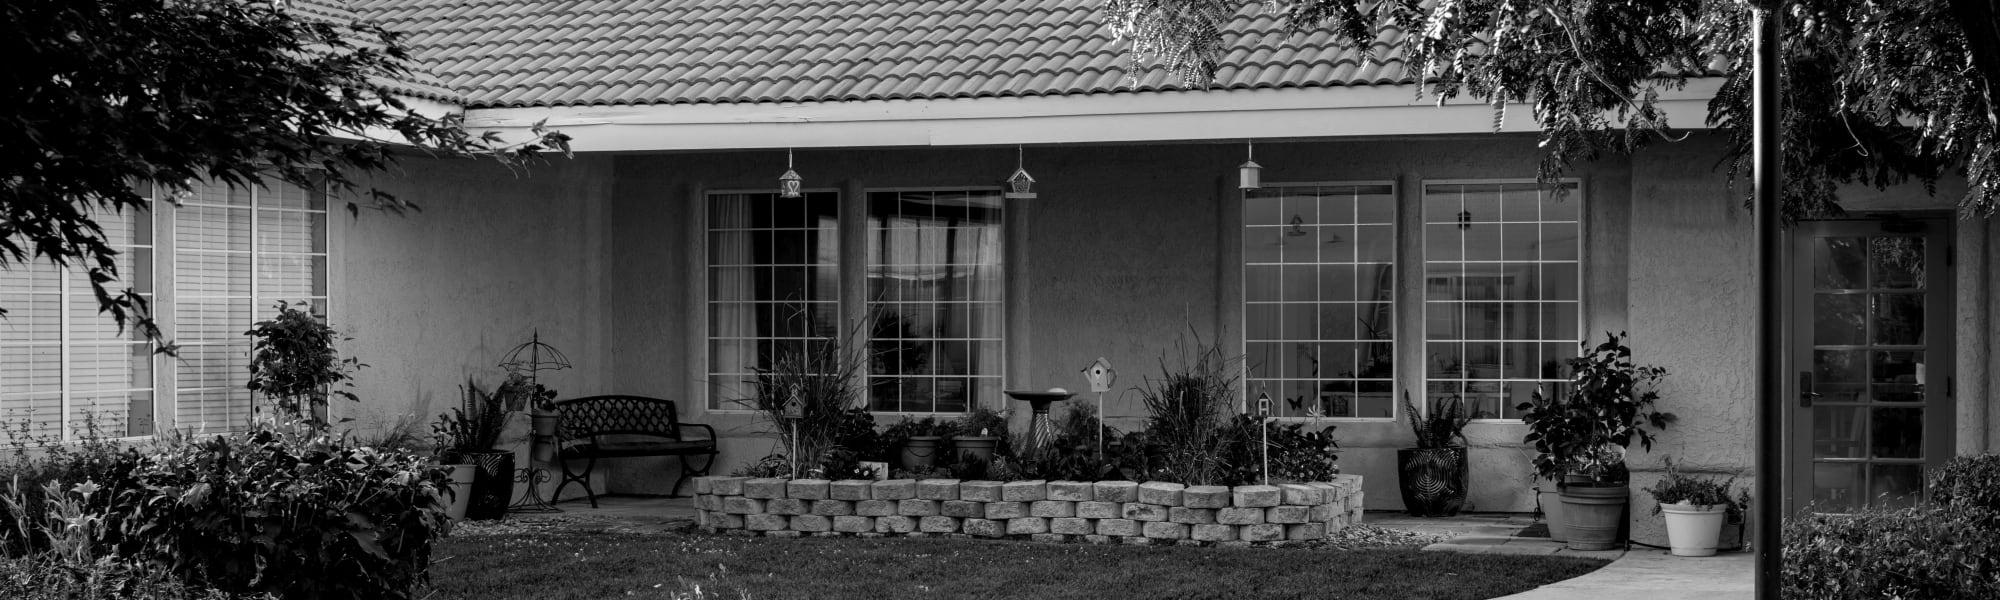 Directions to Pacifica Senior Living Fresno in Fresno, California.